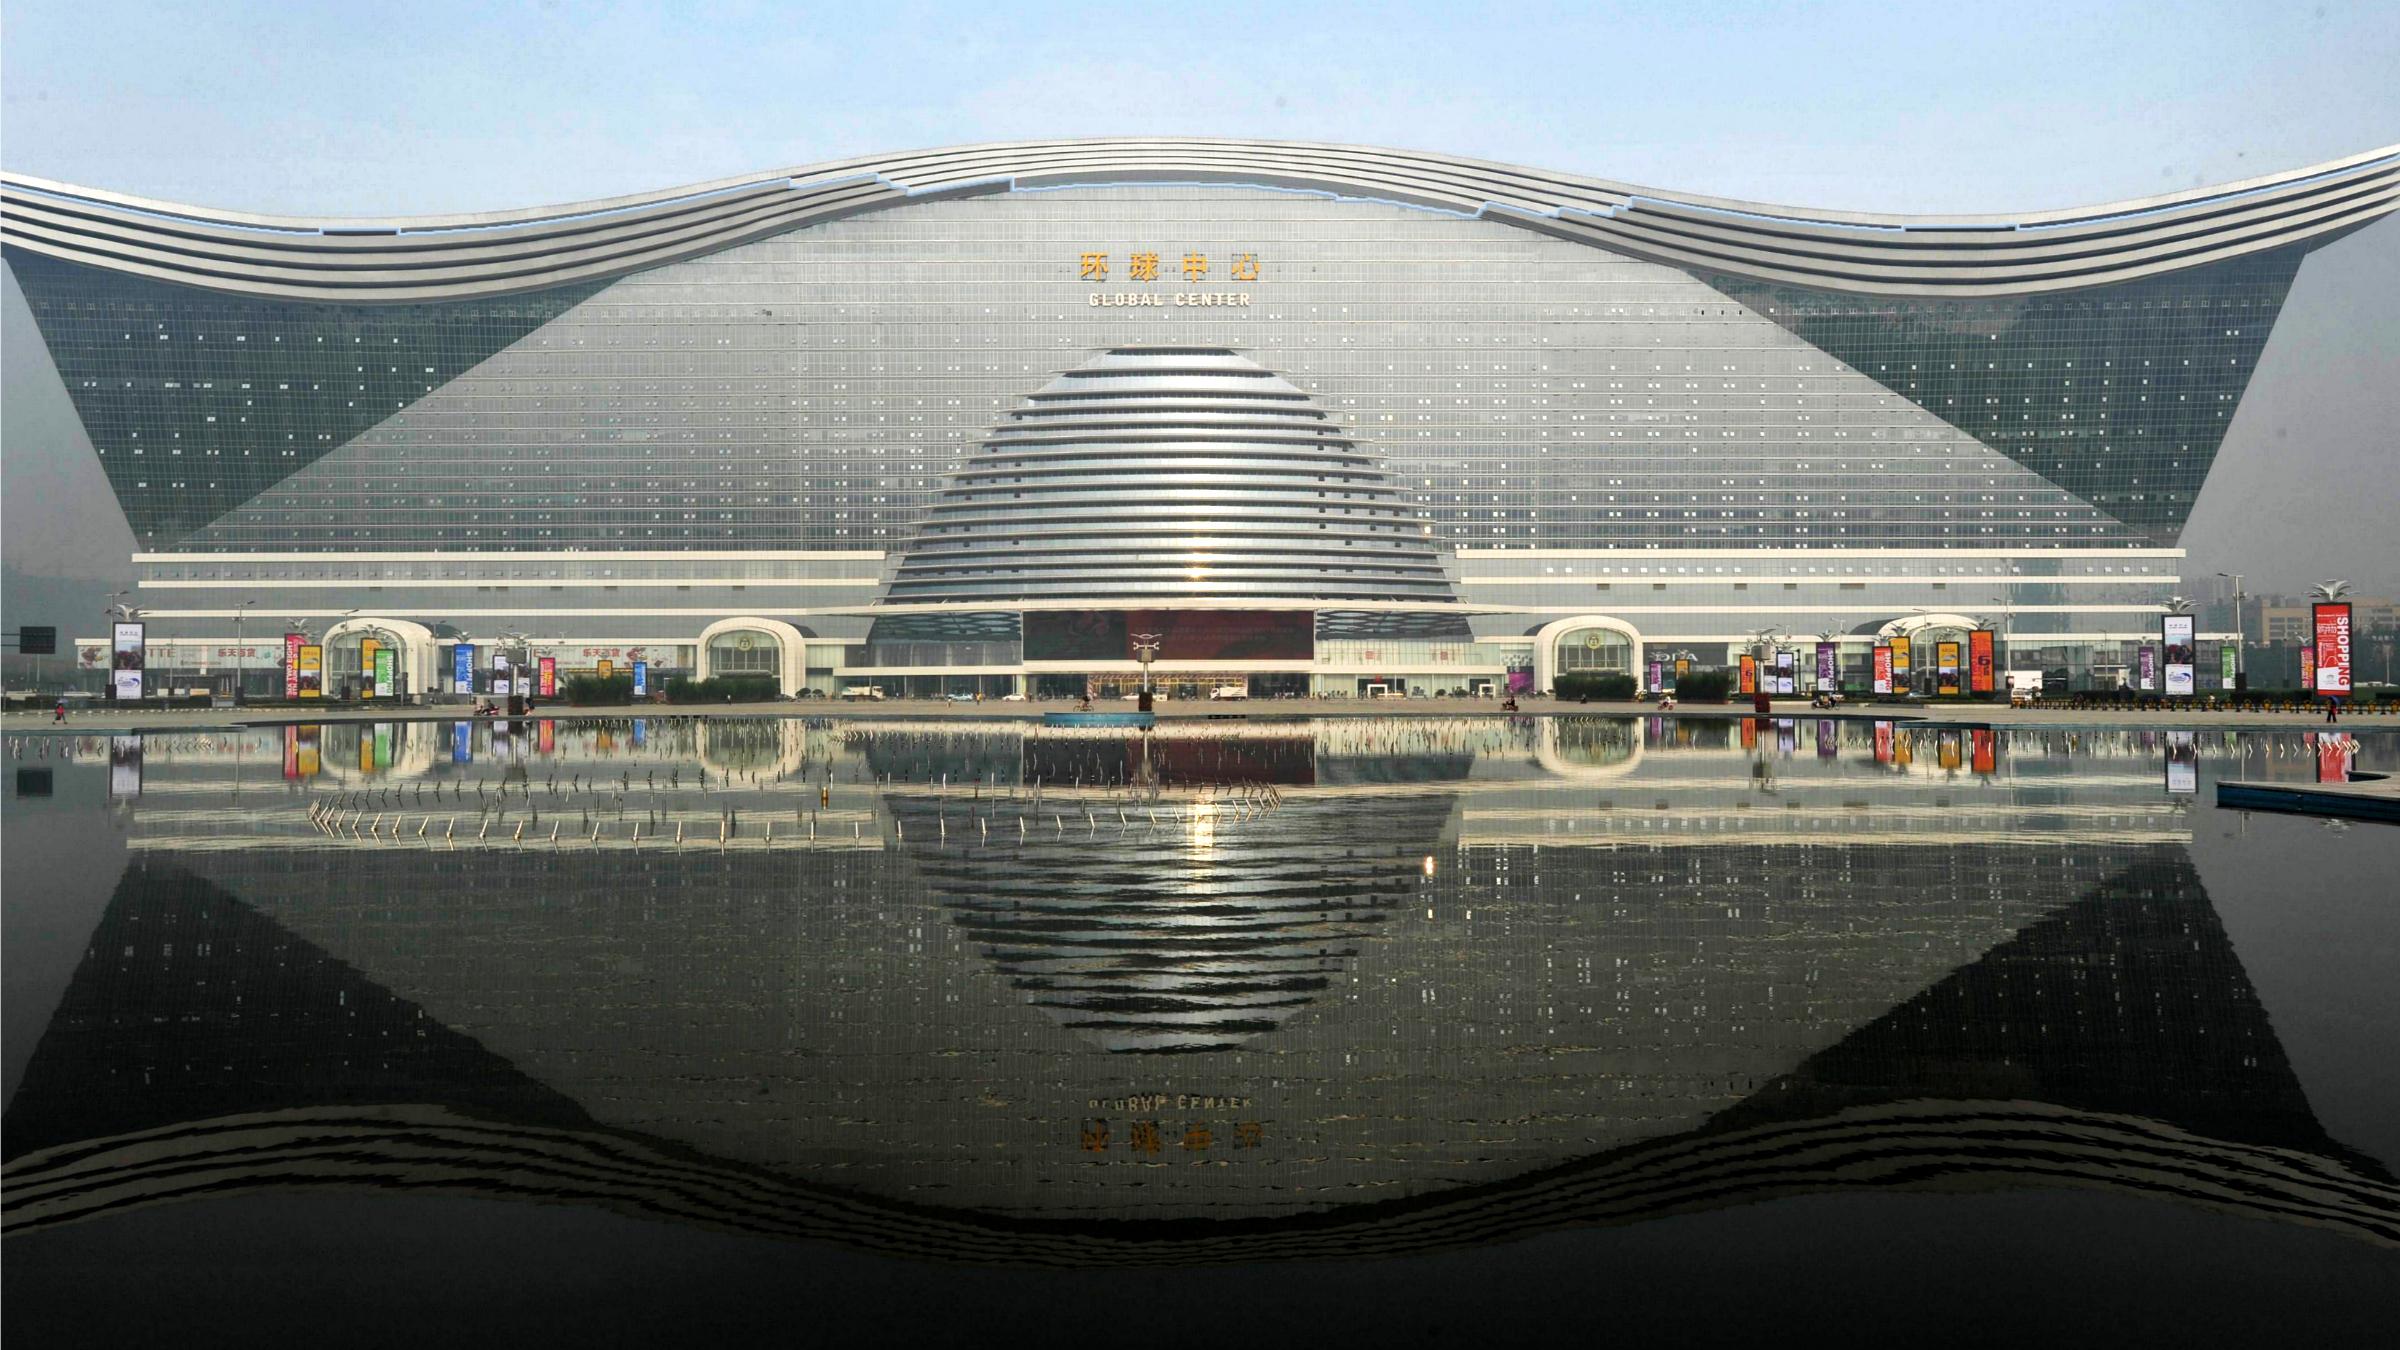 Attirant The Worldu0027s New Largest Building Is Four Times The Size Of Vatican City U2014  Quartz